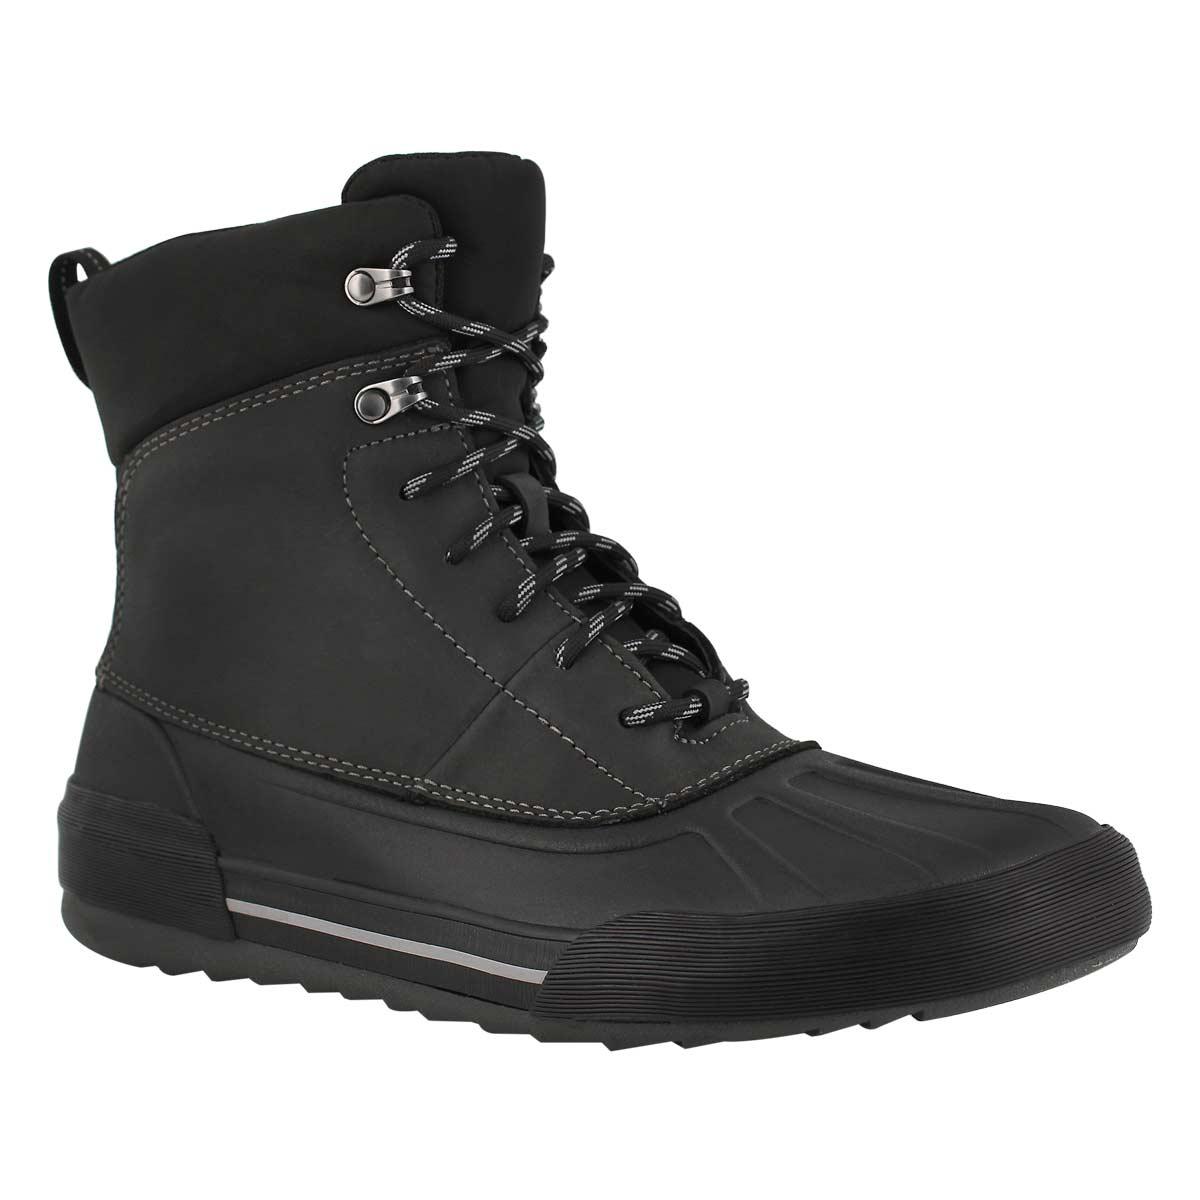 Mns Bowman Peak blk wtpf ankle boot